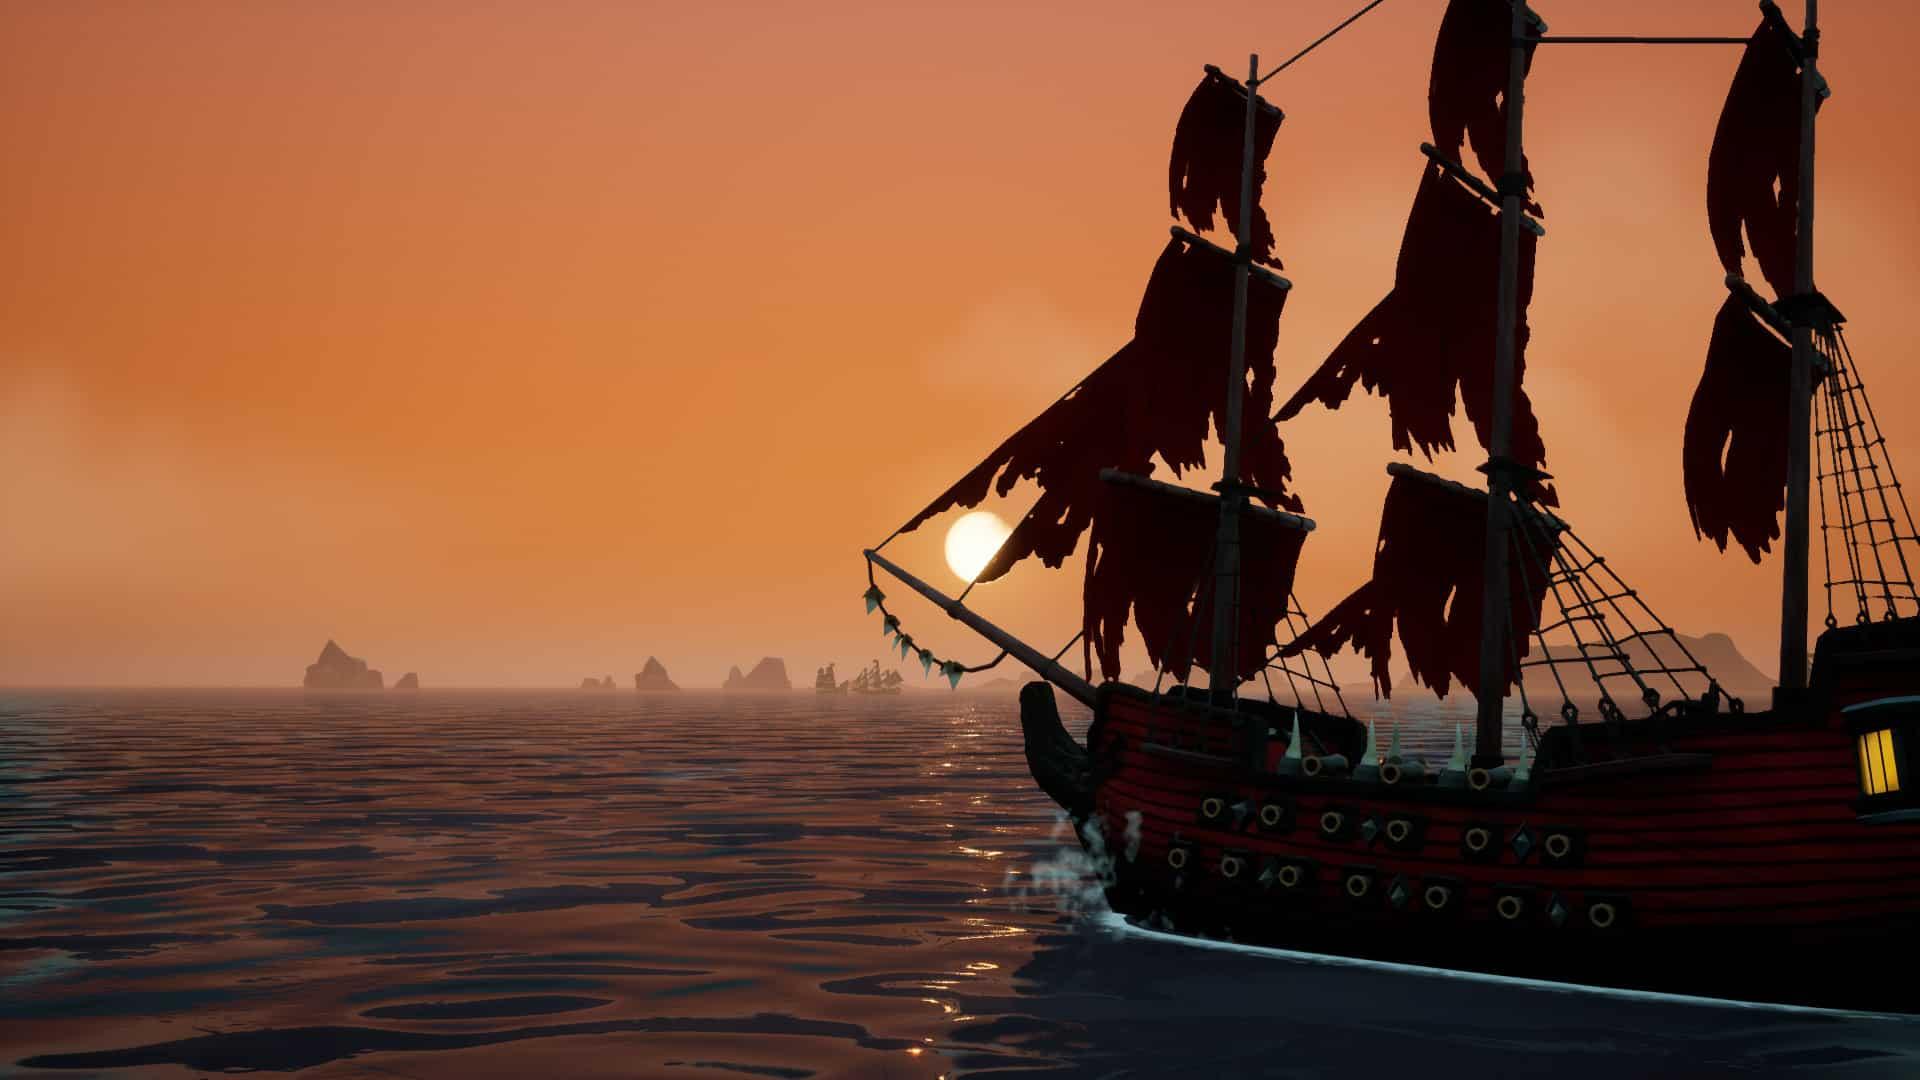 king_of_seas_2